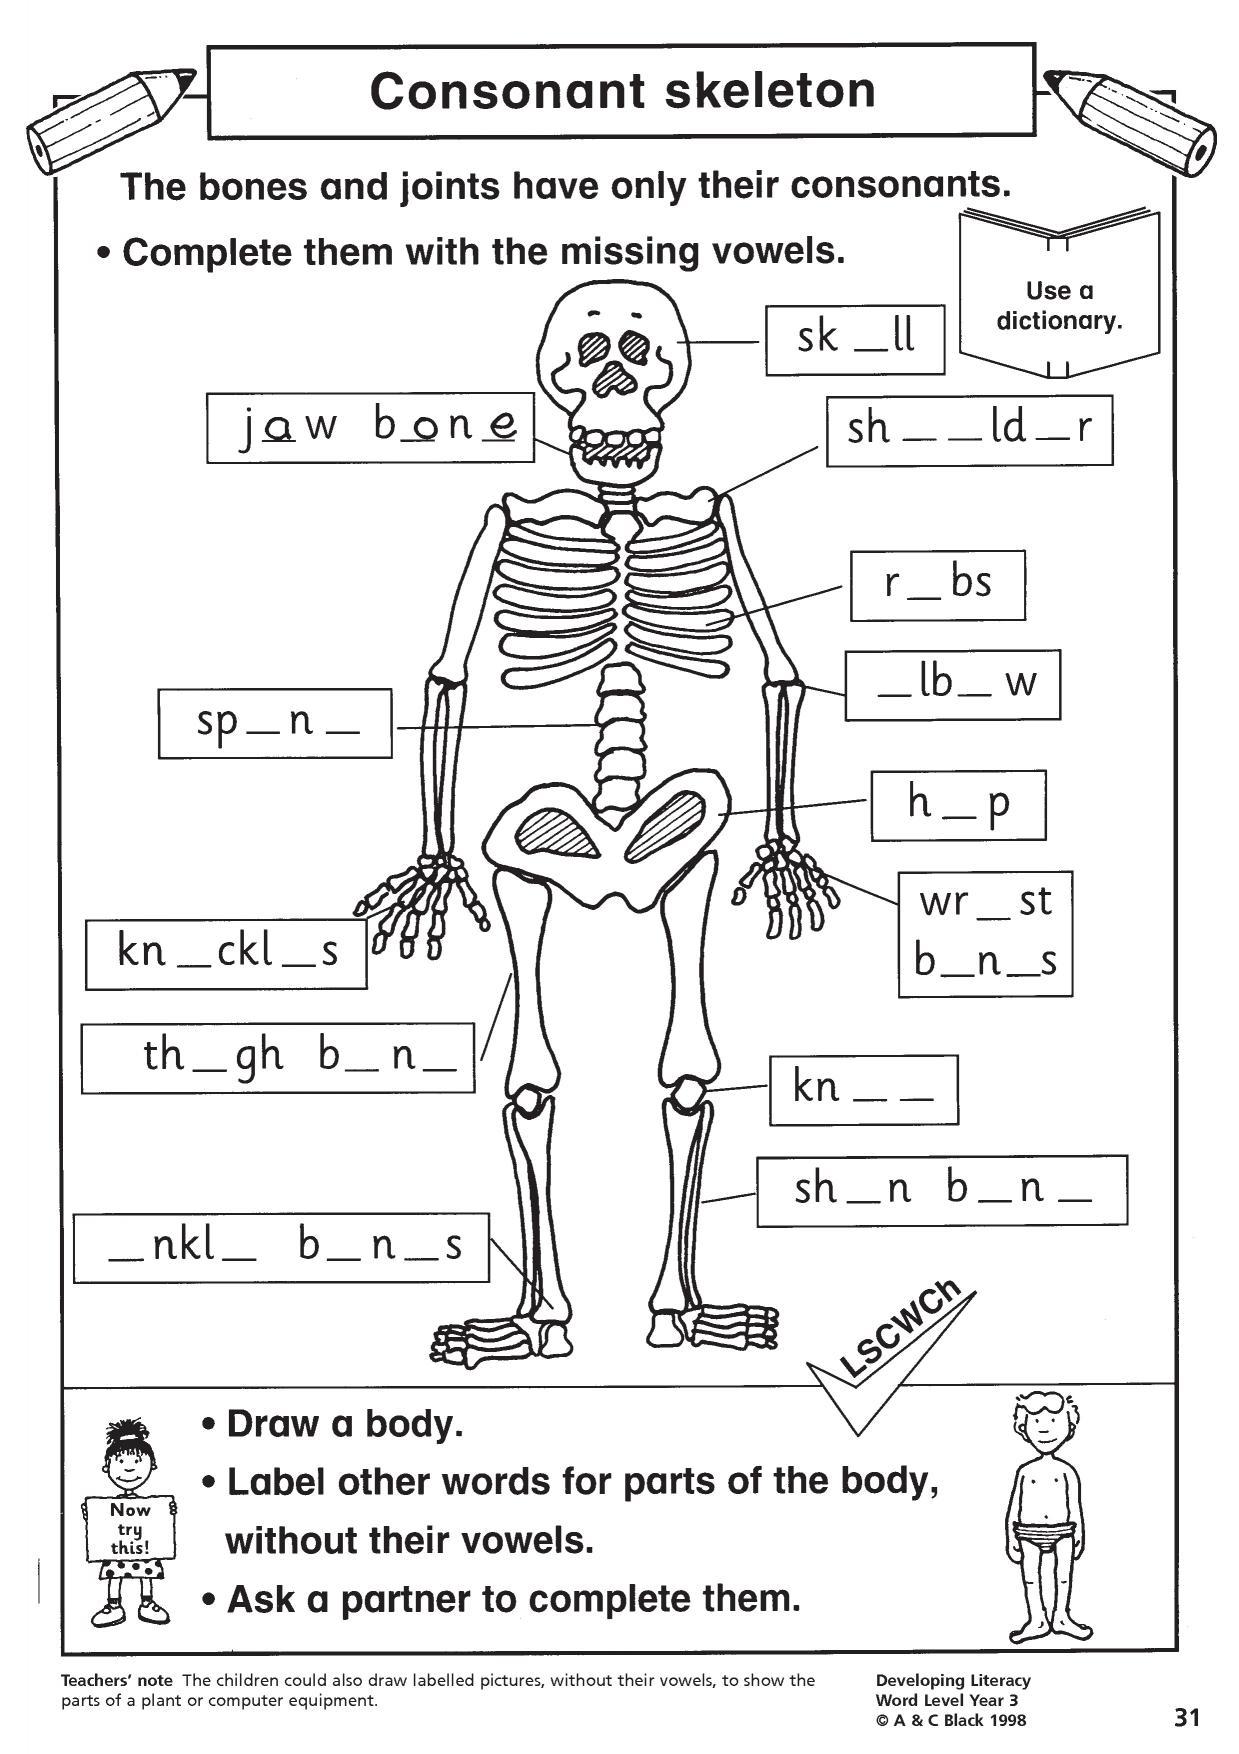 Consonant Skeleton